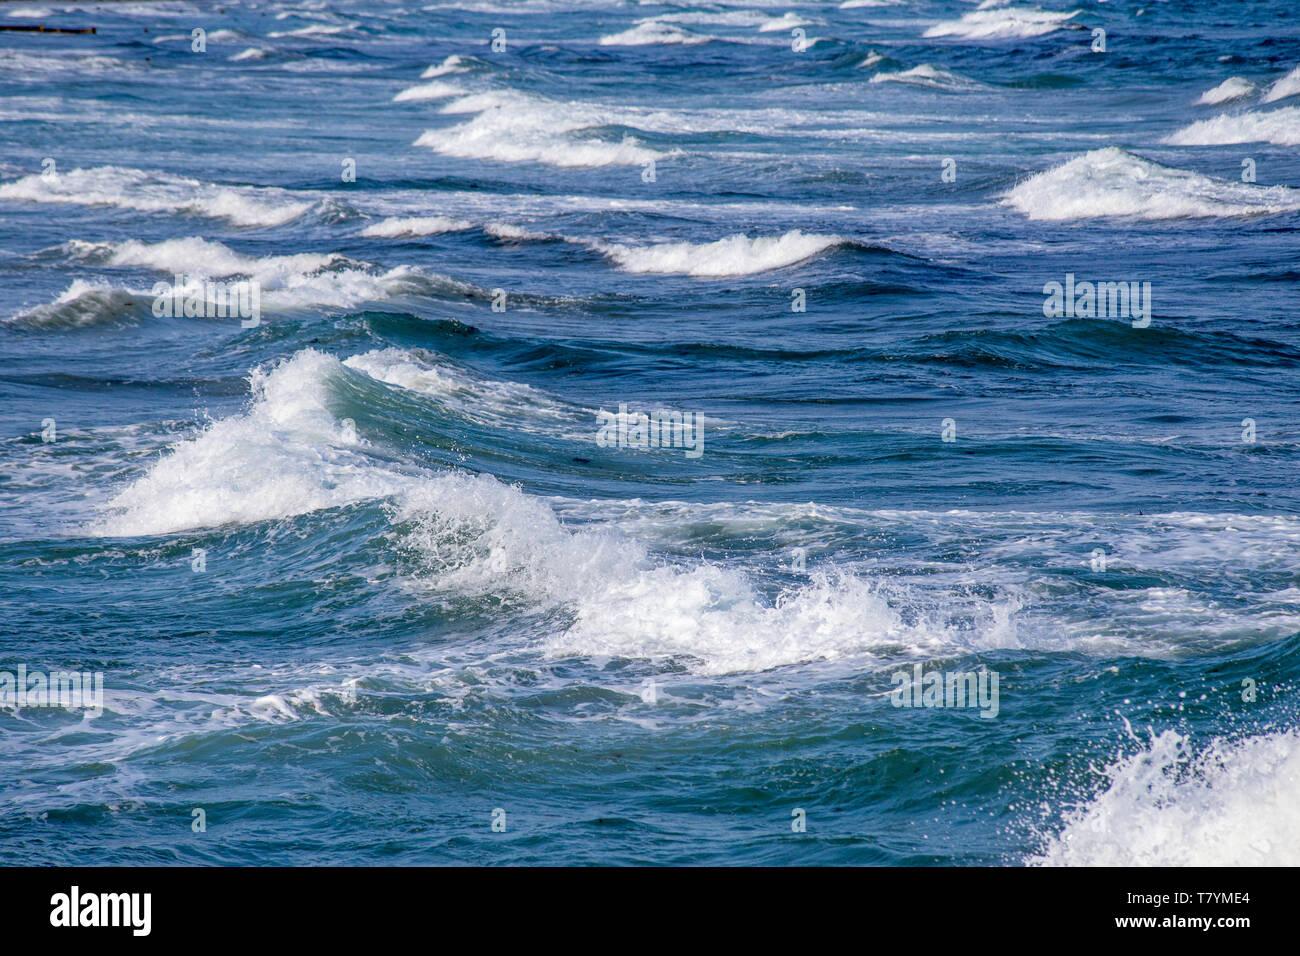 Olas rompiendo en la playa Imagen De Stock